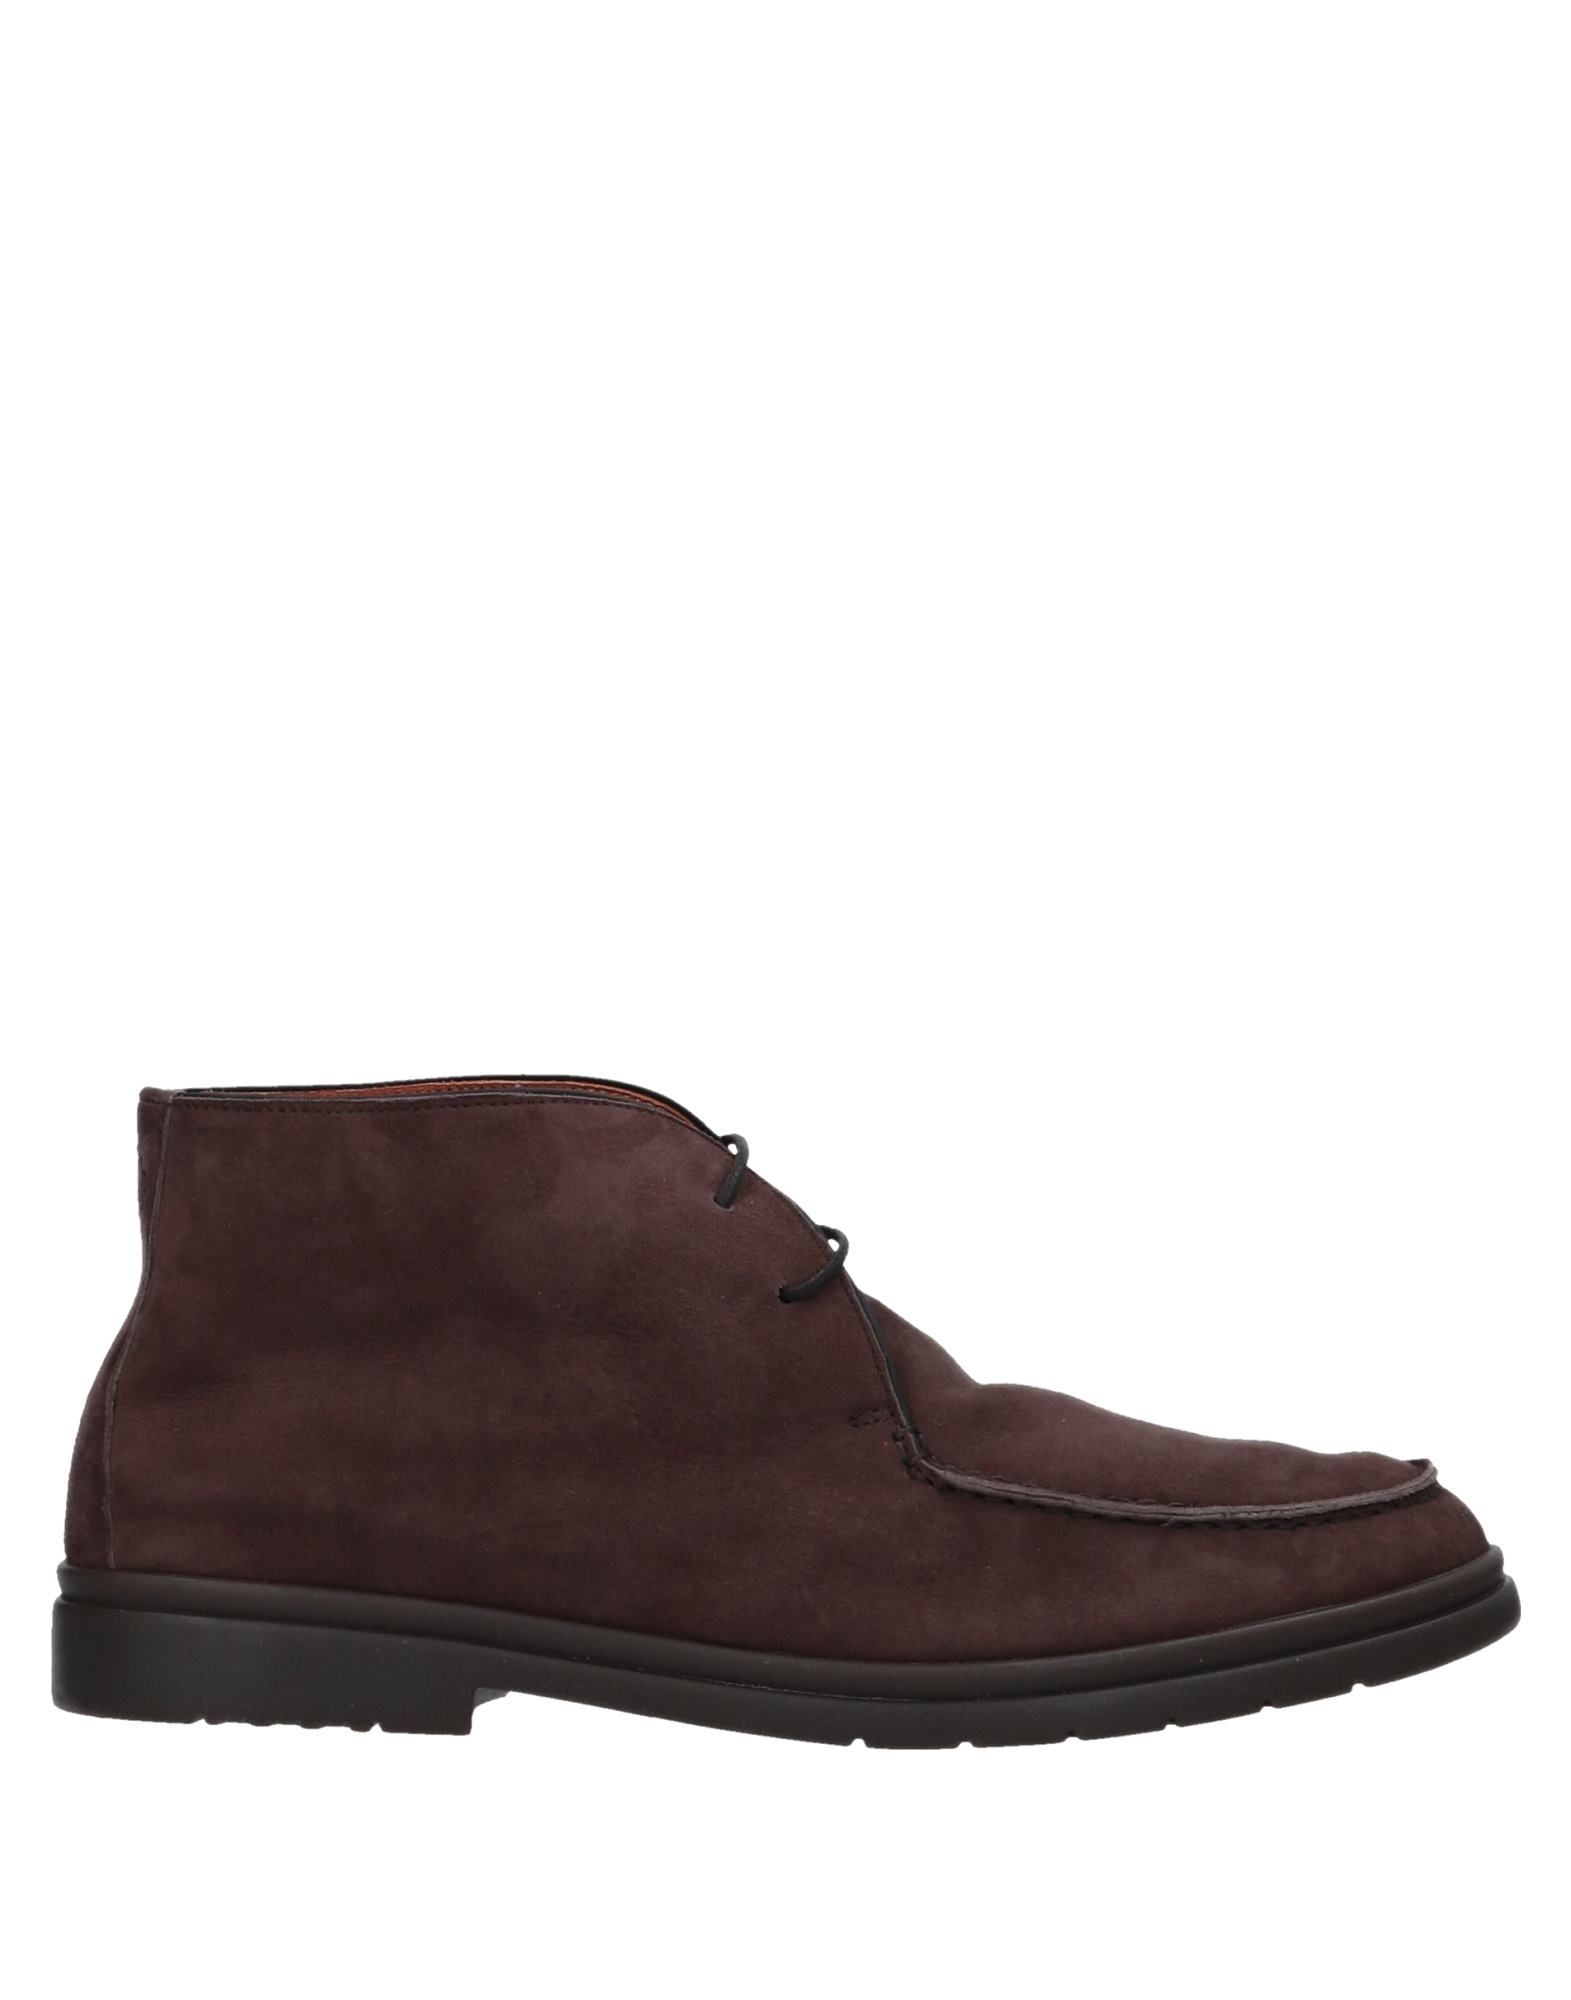 Andrea Ventura Firenze Stiefelette Herren  11529097SH Gute Qualität beliebte Schuhe